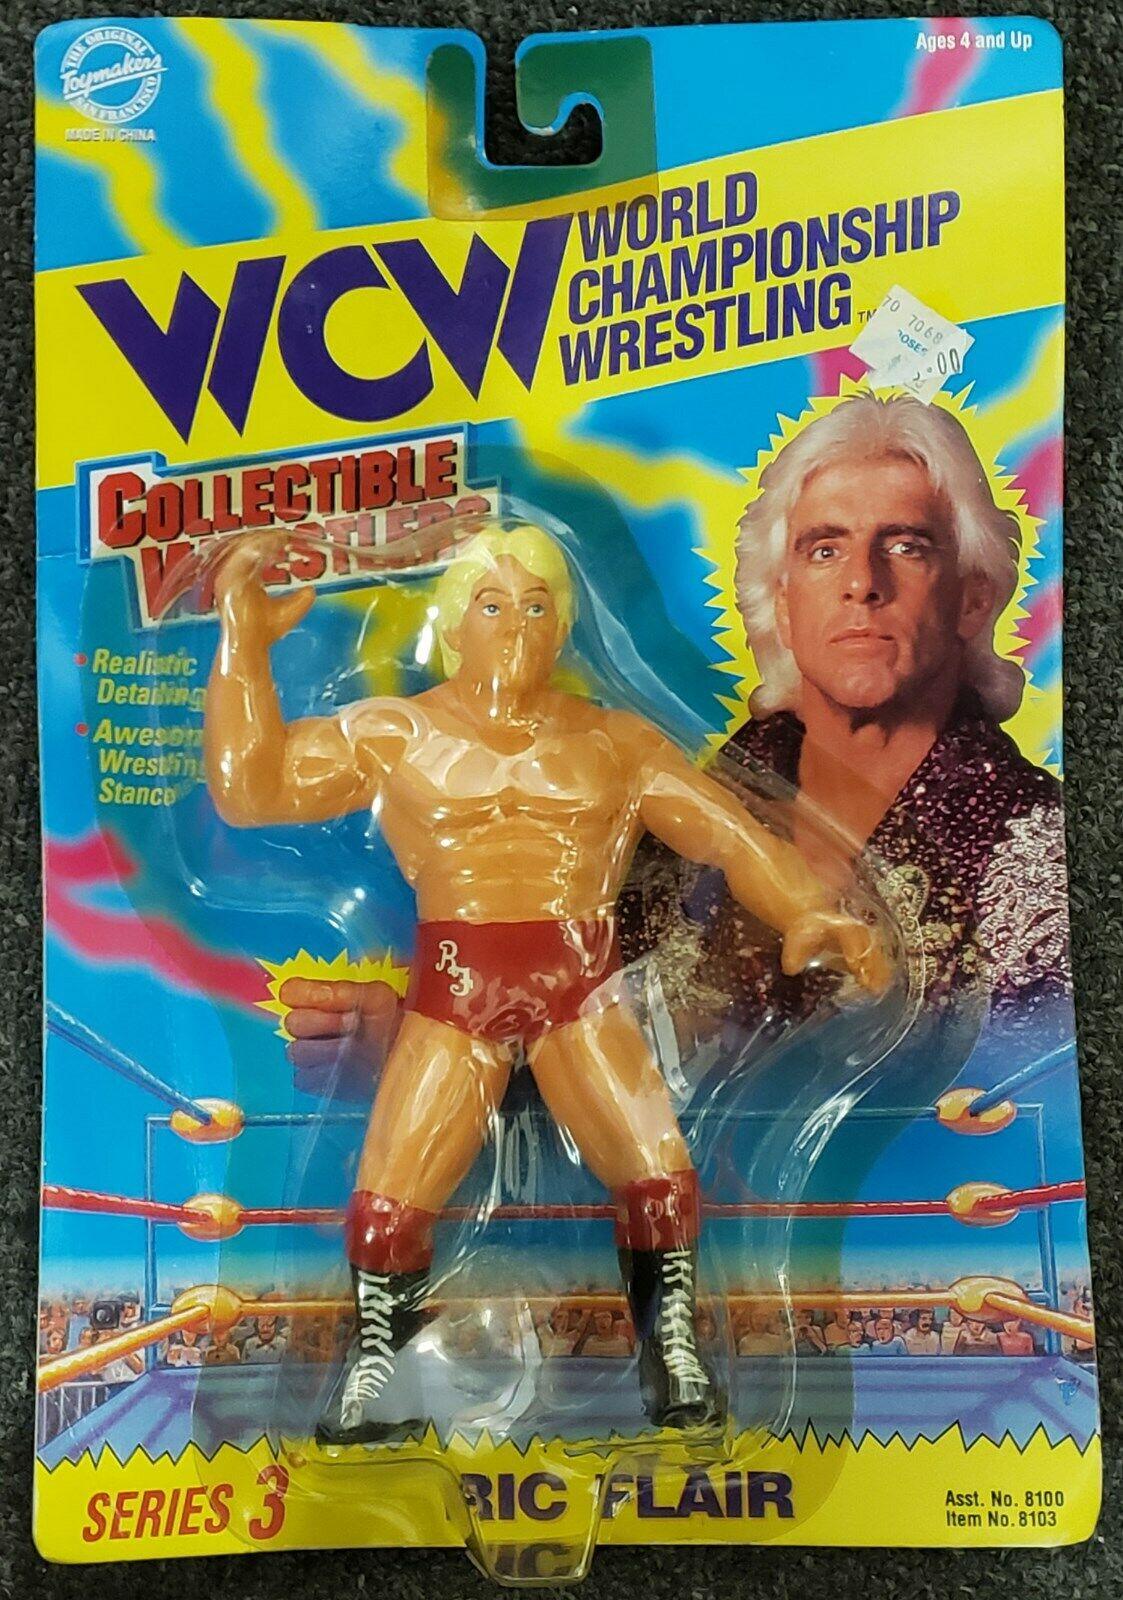 Ric Flair WCW Series 3 Wrestling Figure, WWE NWA World Championship Wrestling